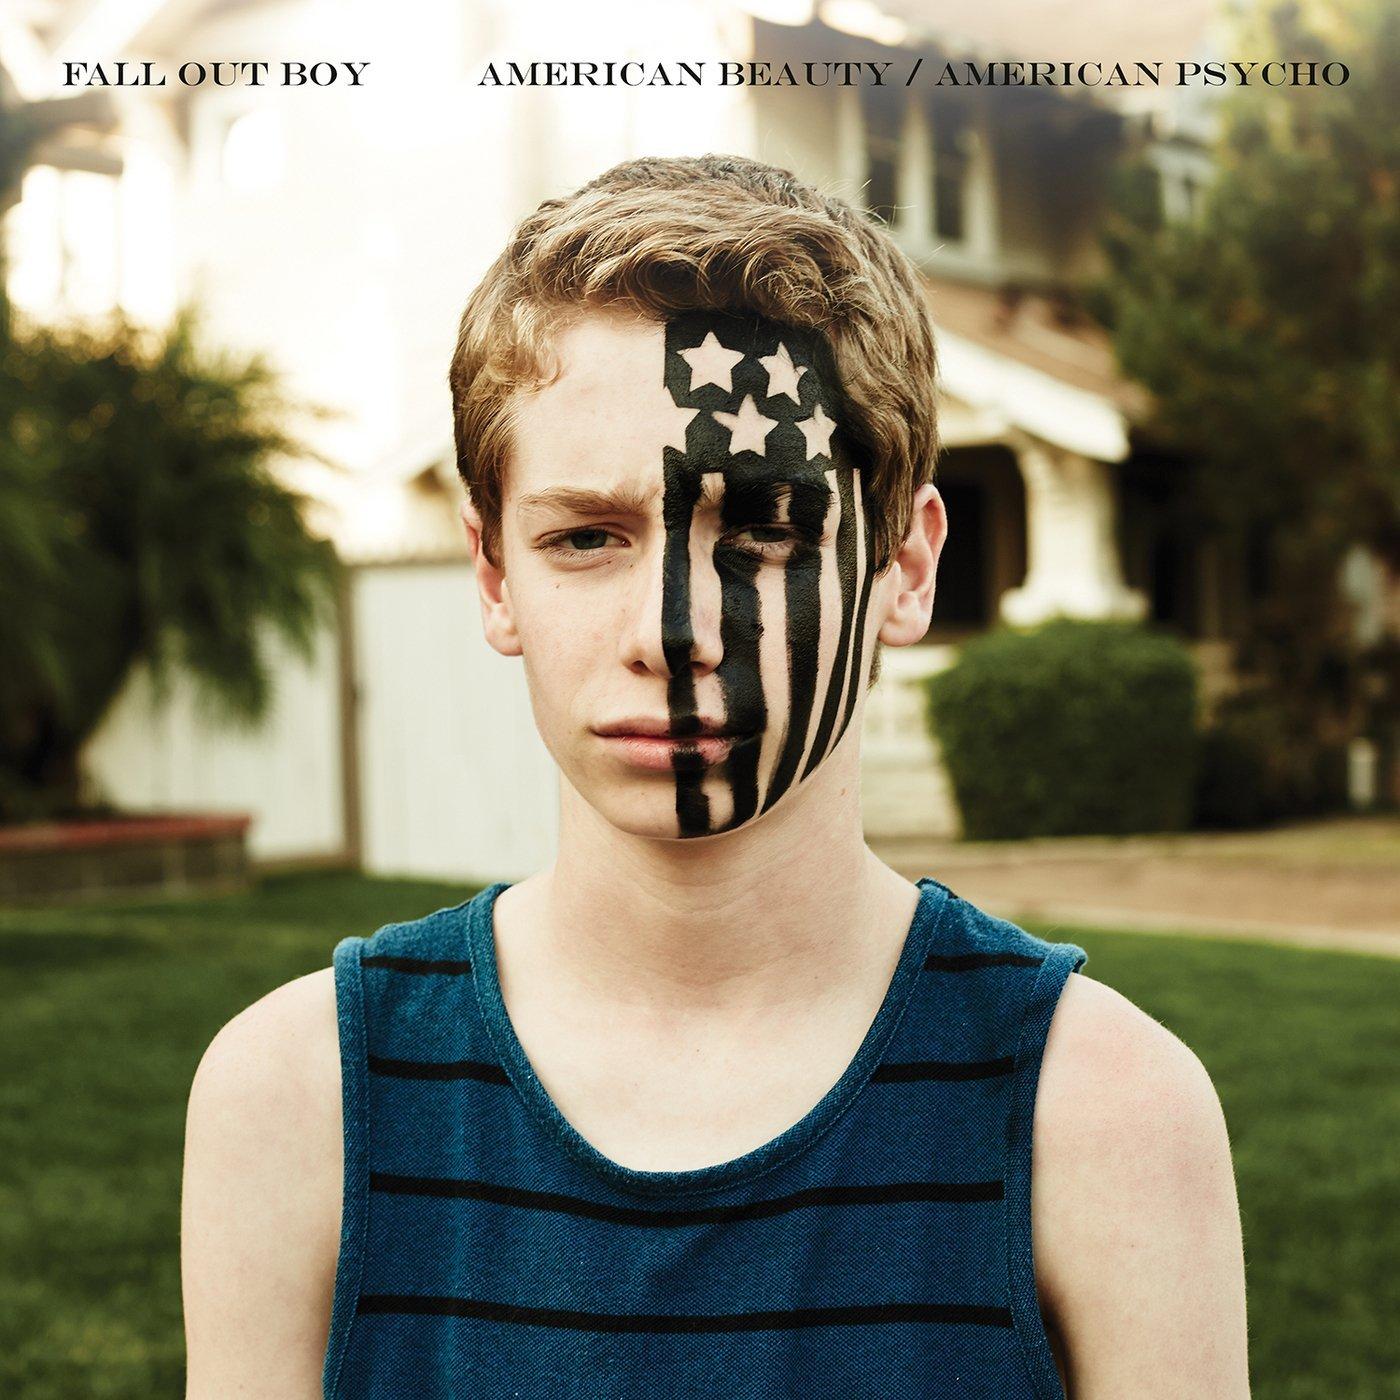 Fall Out Boy - American Beauty/American Psycho - Vinyl $10.83